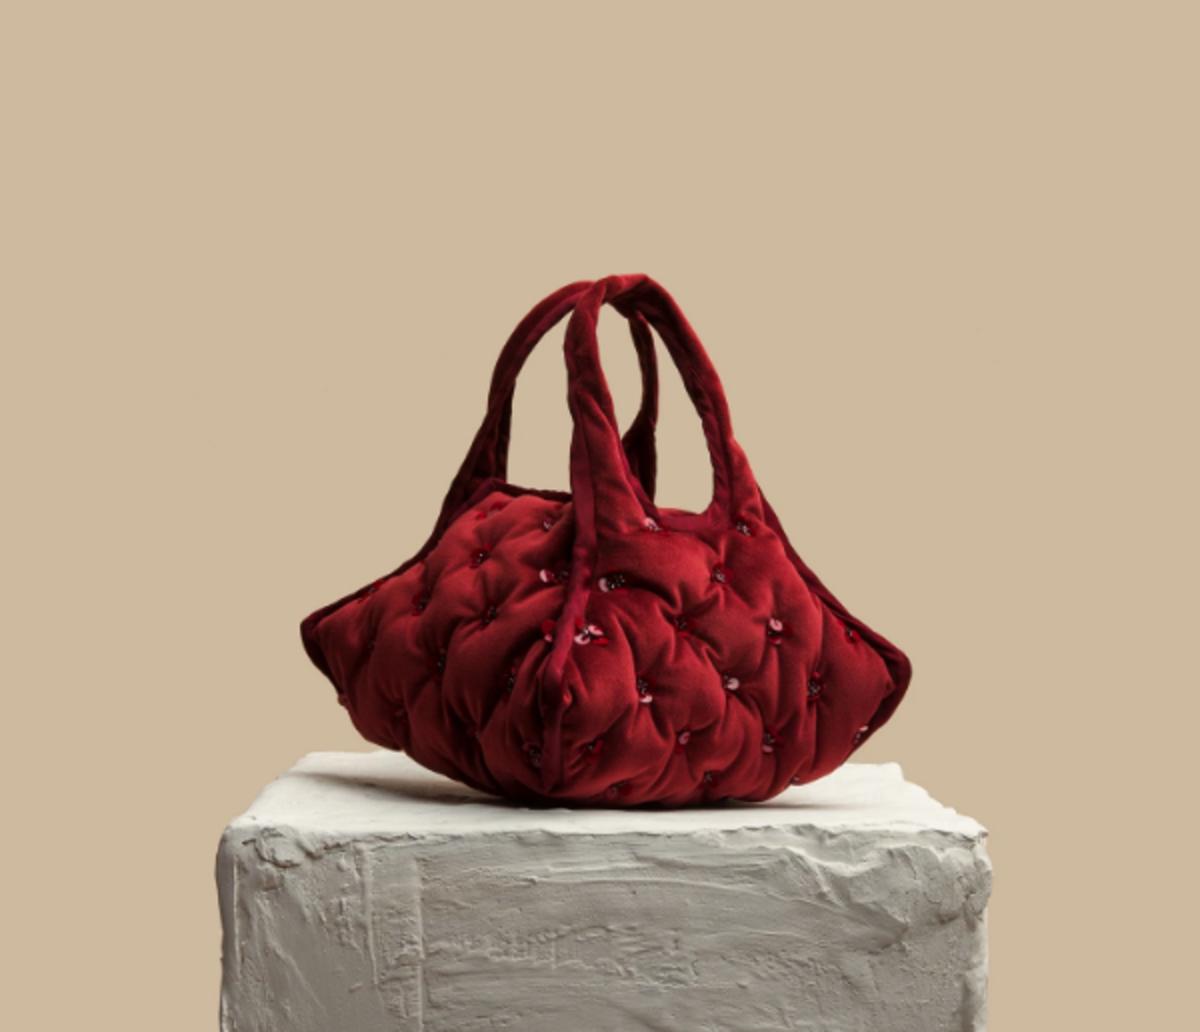 Khaore Burgundy Pillow Handbag, $350, available here.